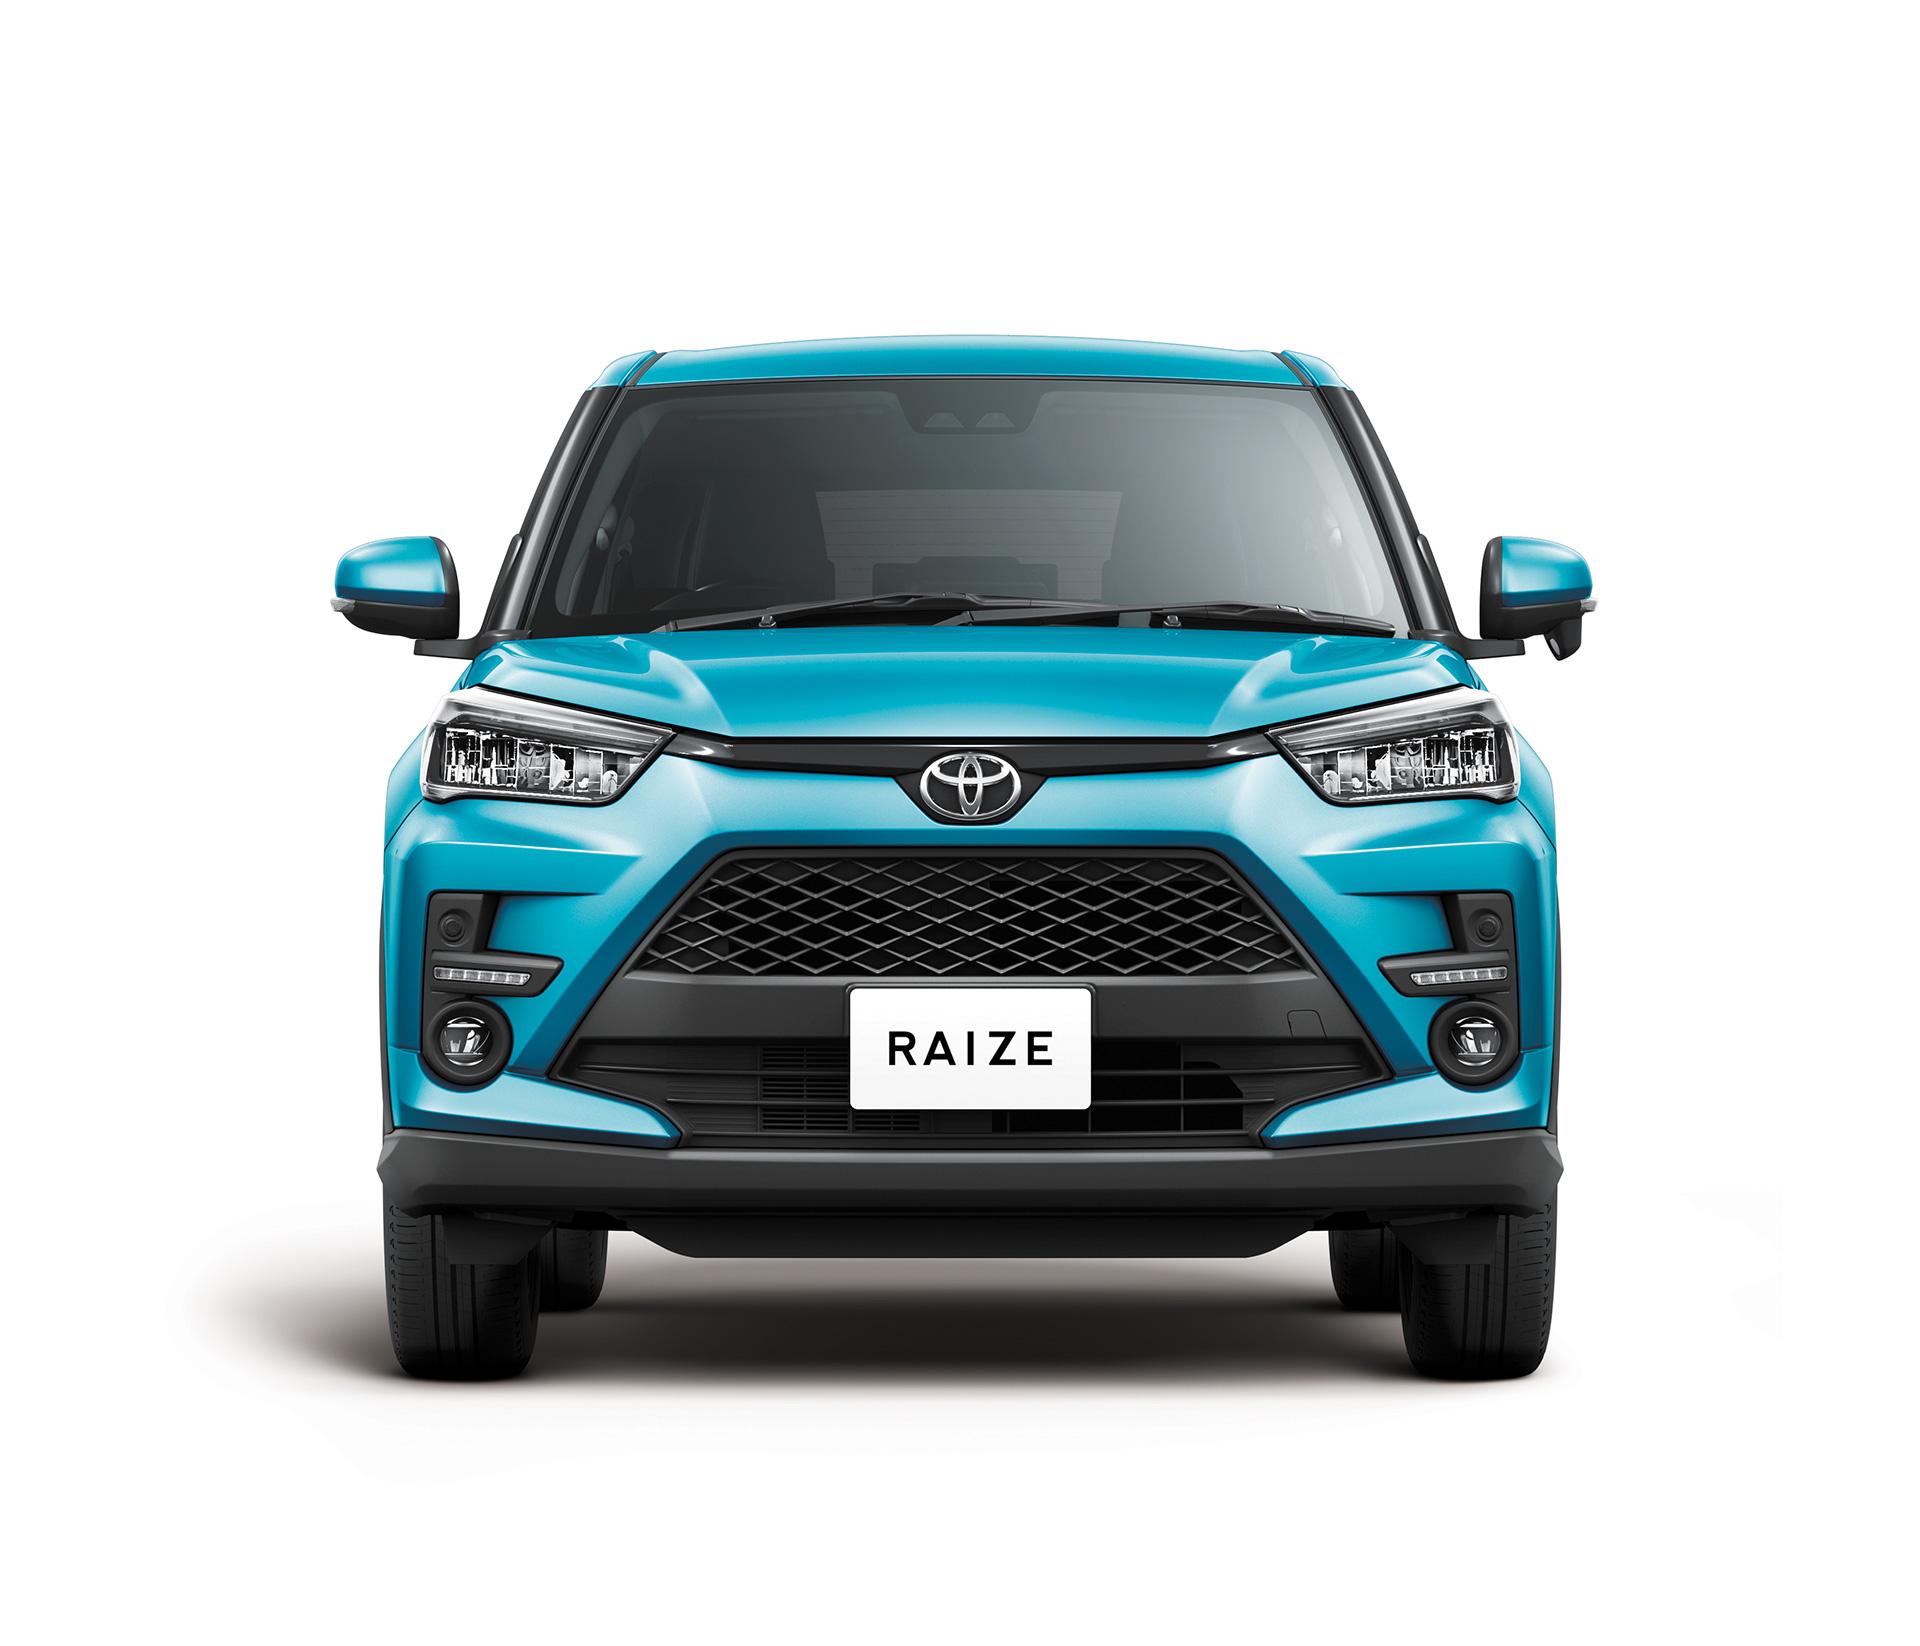 Toyota Raize ร่างจำแลง Daihatsu Rocky ลุยตลาดรถเล็ก